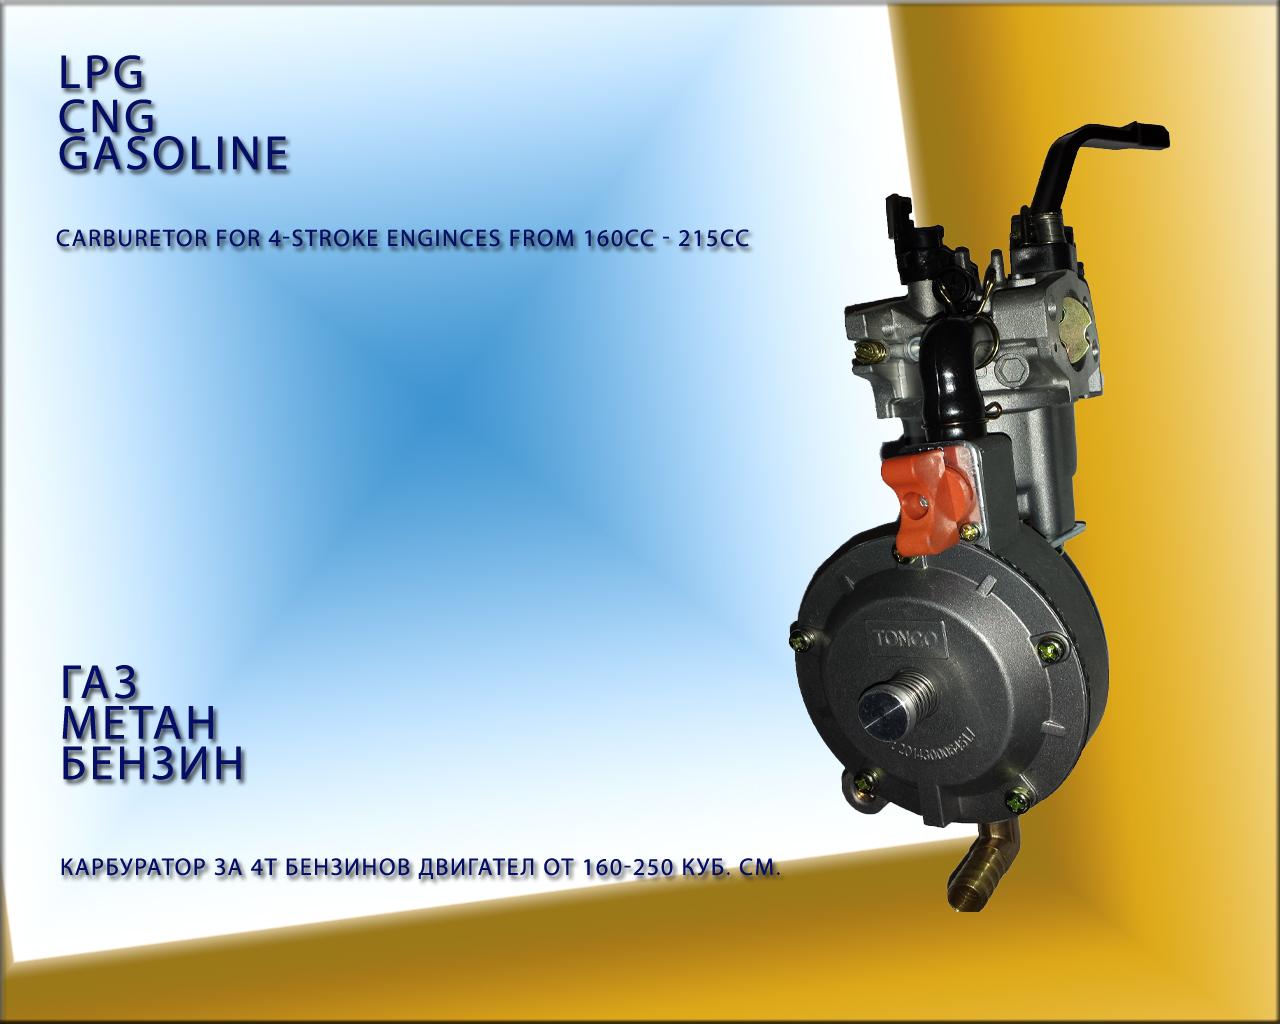 Карбуратор за газ/метан/бензин от 5к.с. до 7.5 к.с.